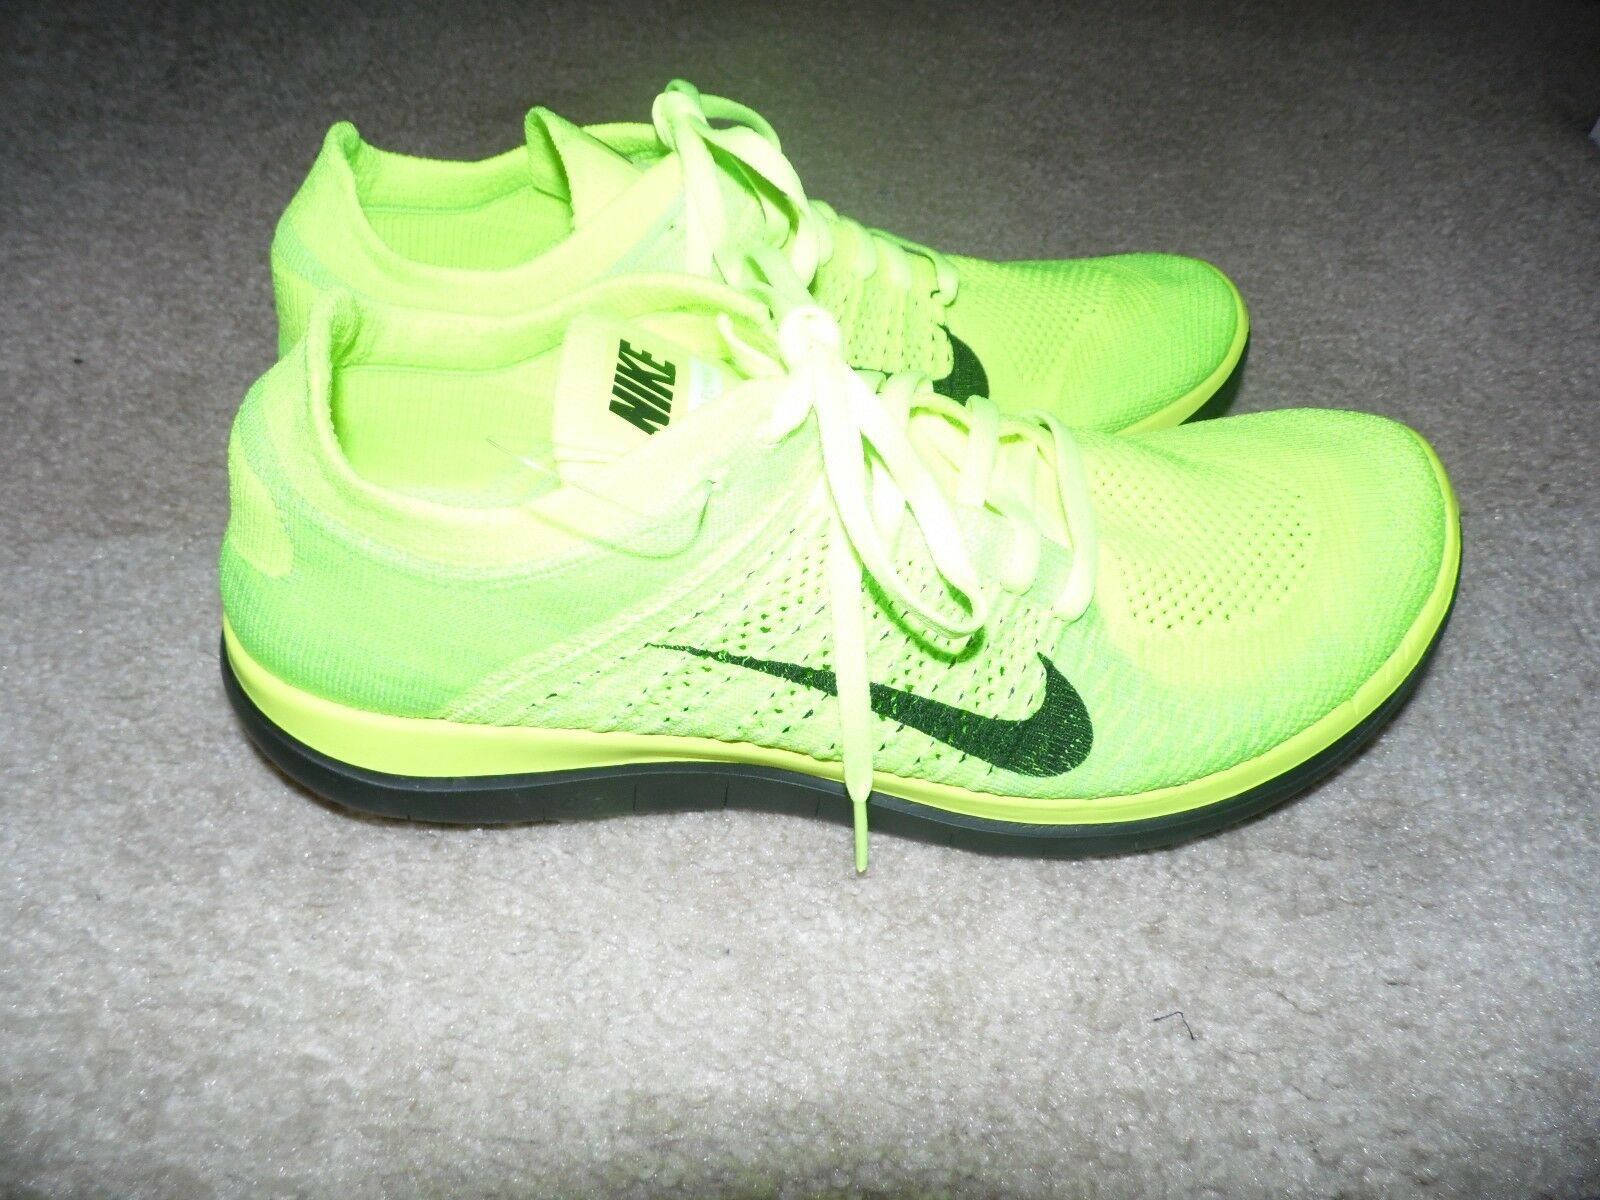 New Sz 13 Men's Nike Free Flyknit 631053 700 Volt Black Electric Green